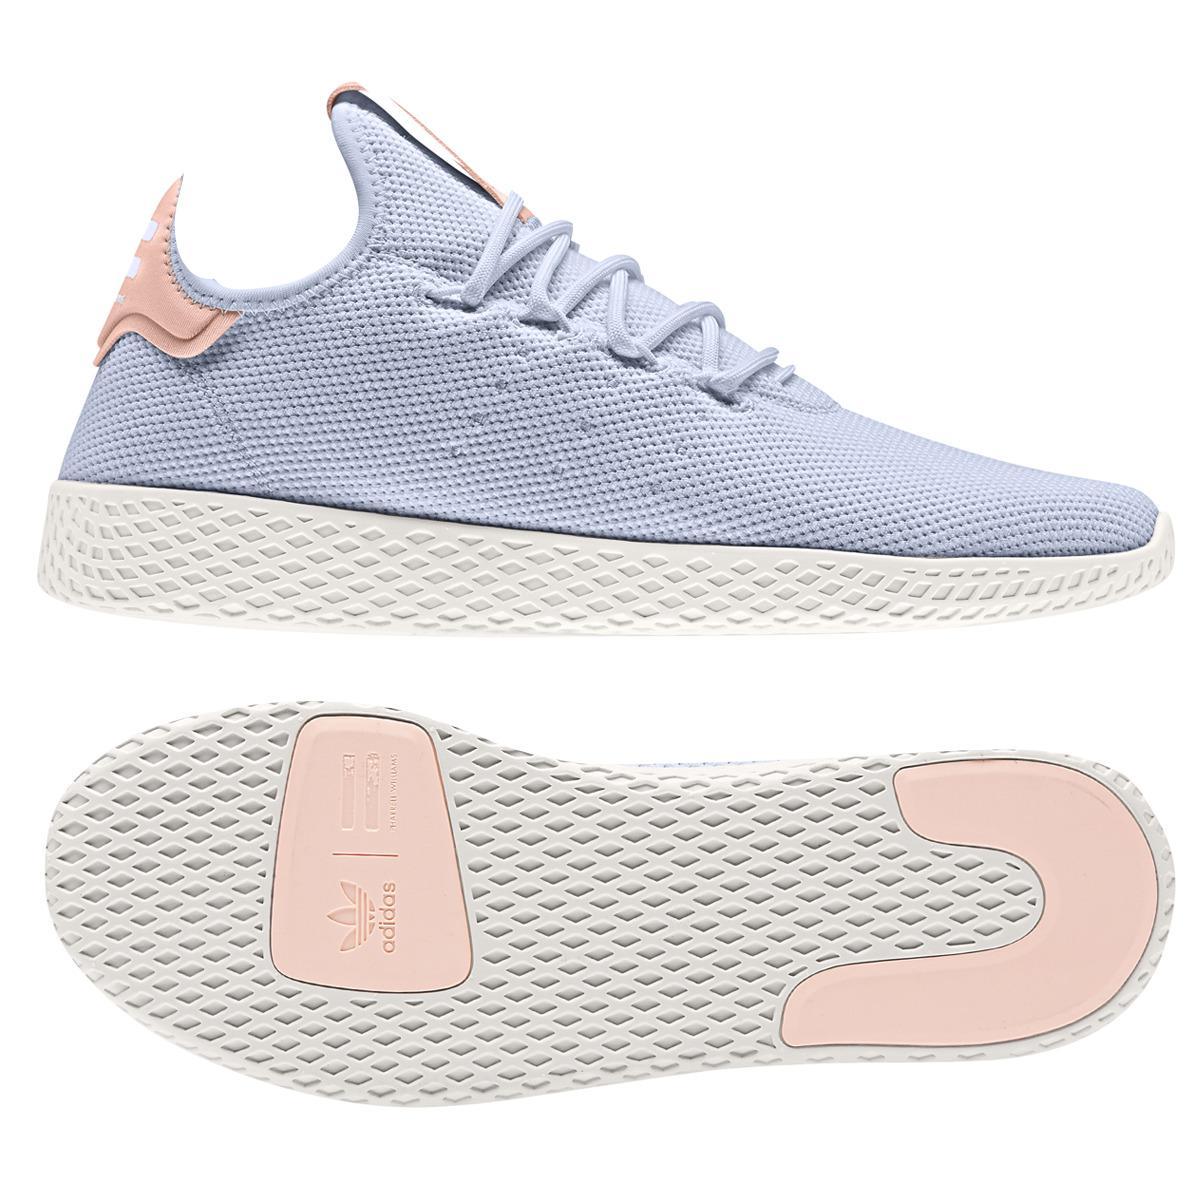 74bb6f891 Lyst - adidas Originals Pharrell Williams Tennis Hu Shoes in Blue